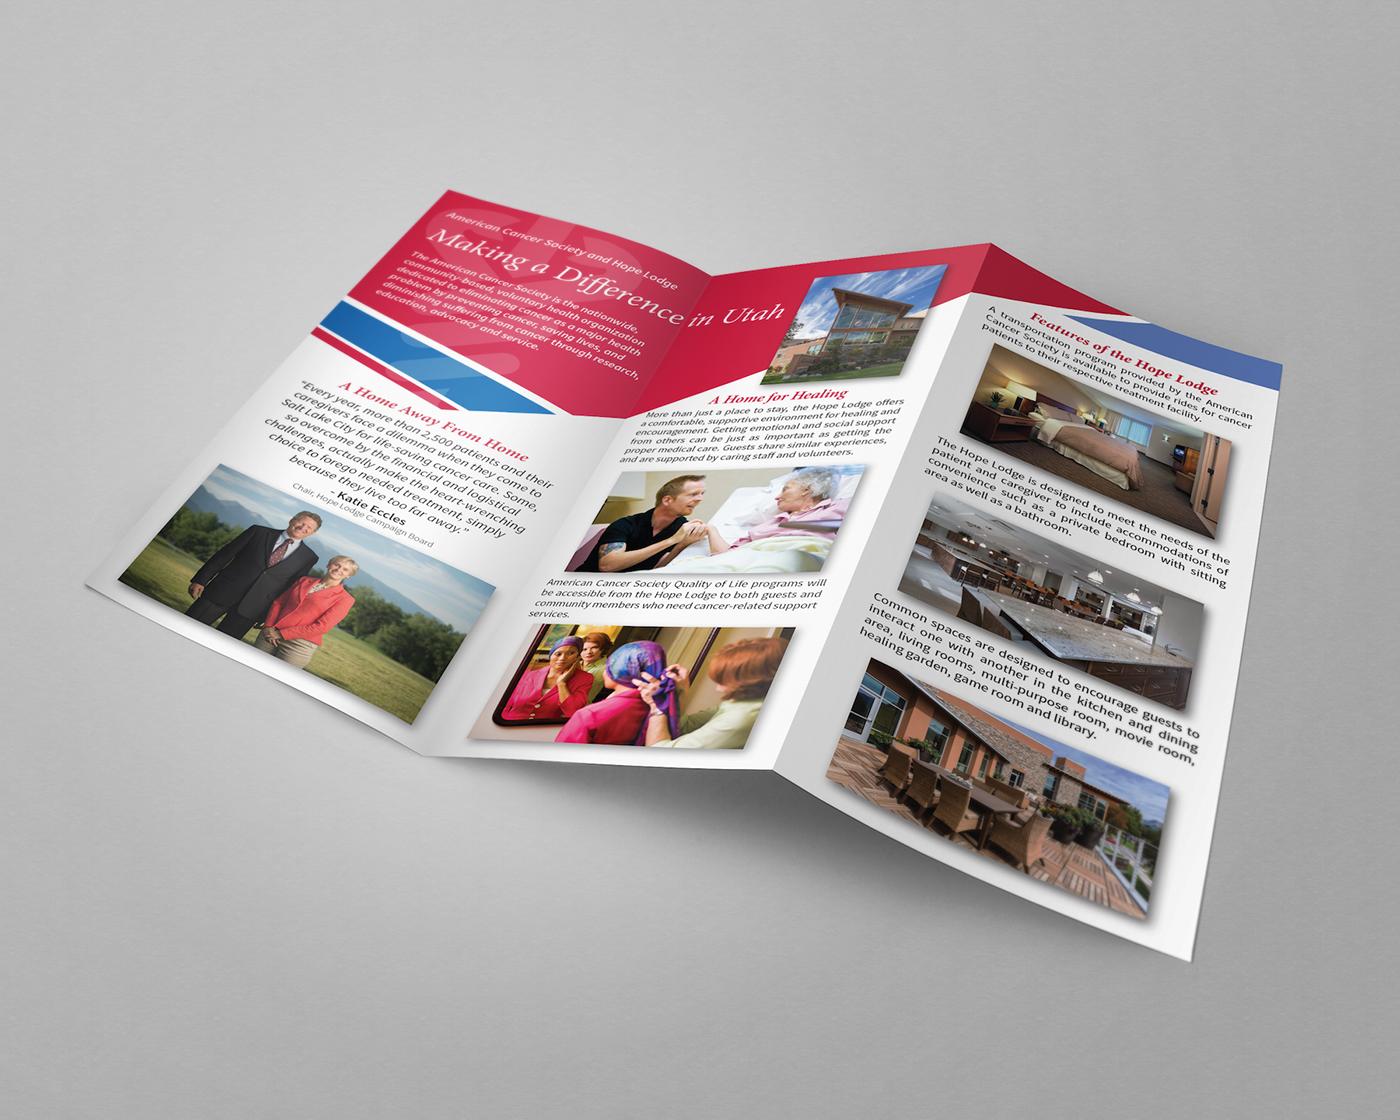 SLC Hope Lodge Brochure - American Cancer Society on Behance